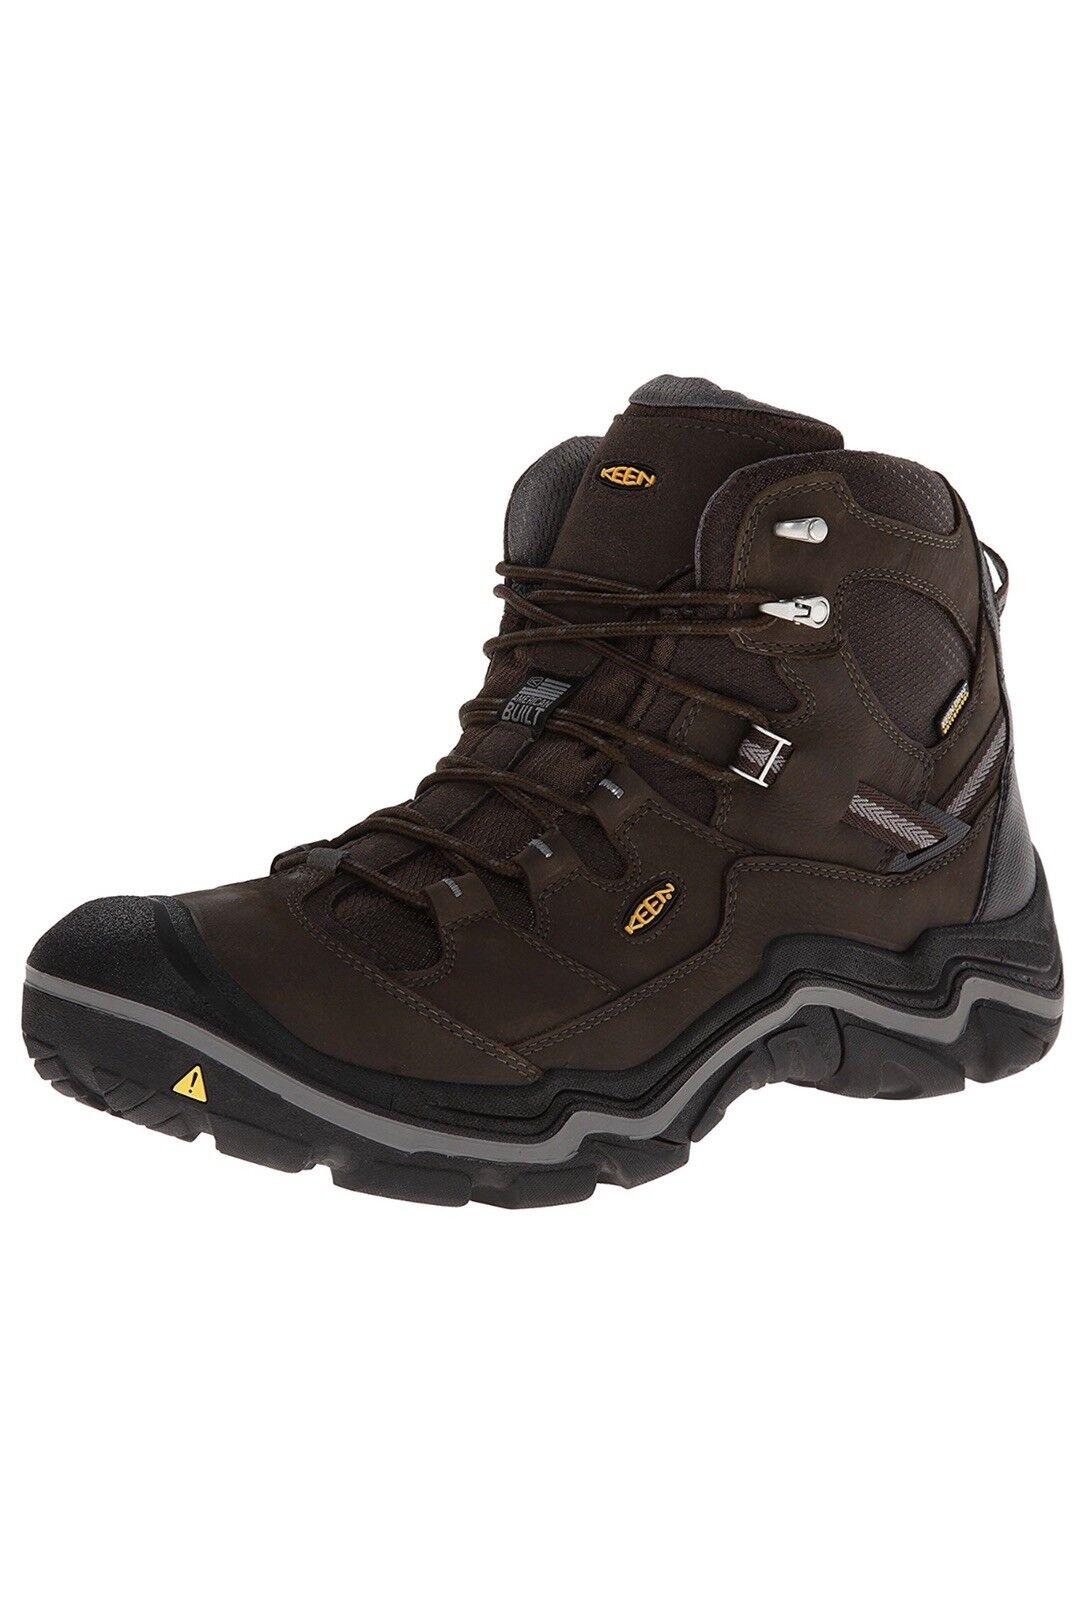 Mens keen hiking shoes II